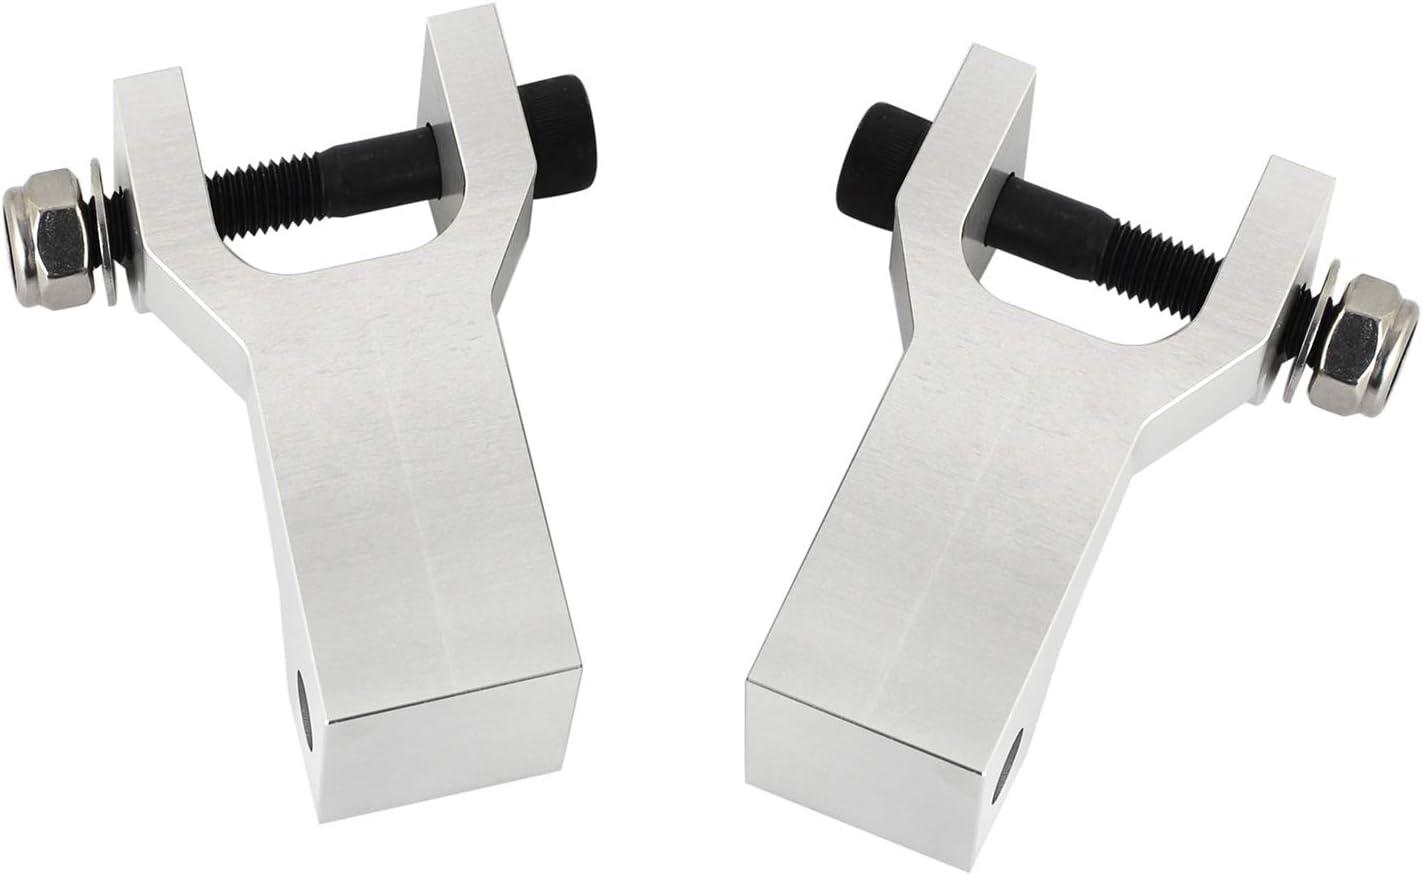 H2Racing CNC Aluminio 3.5 Front Kits de instalaci/ón de suspensi/ón inferior Reemplazar Yam-aha Raptor 350 YFM350,660R YFM660R,700 YFM700